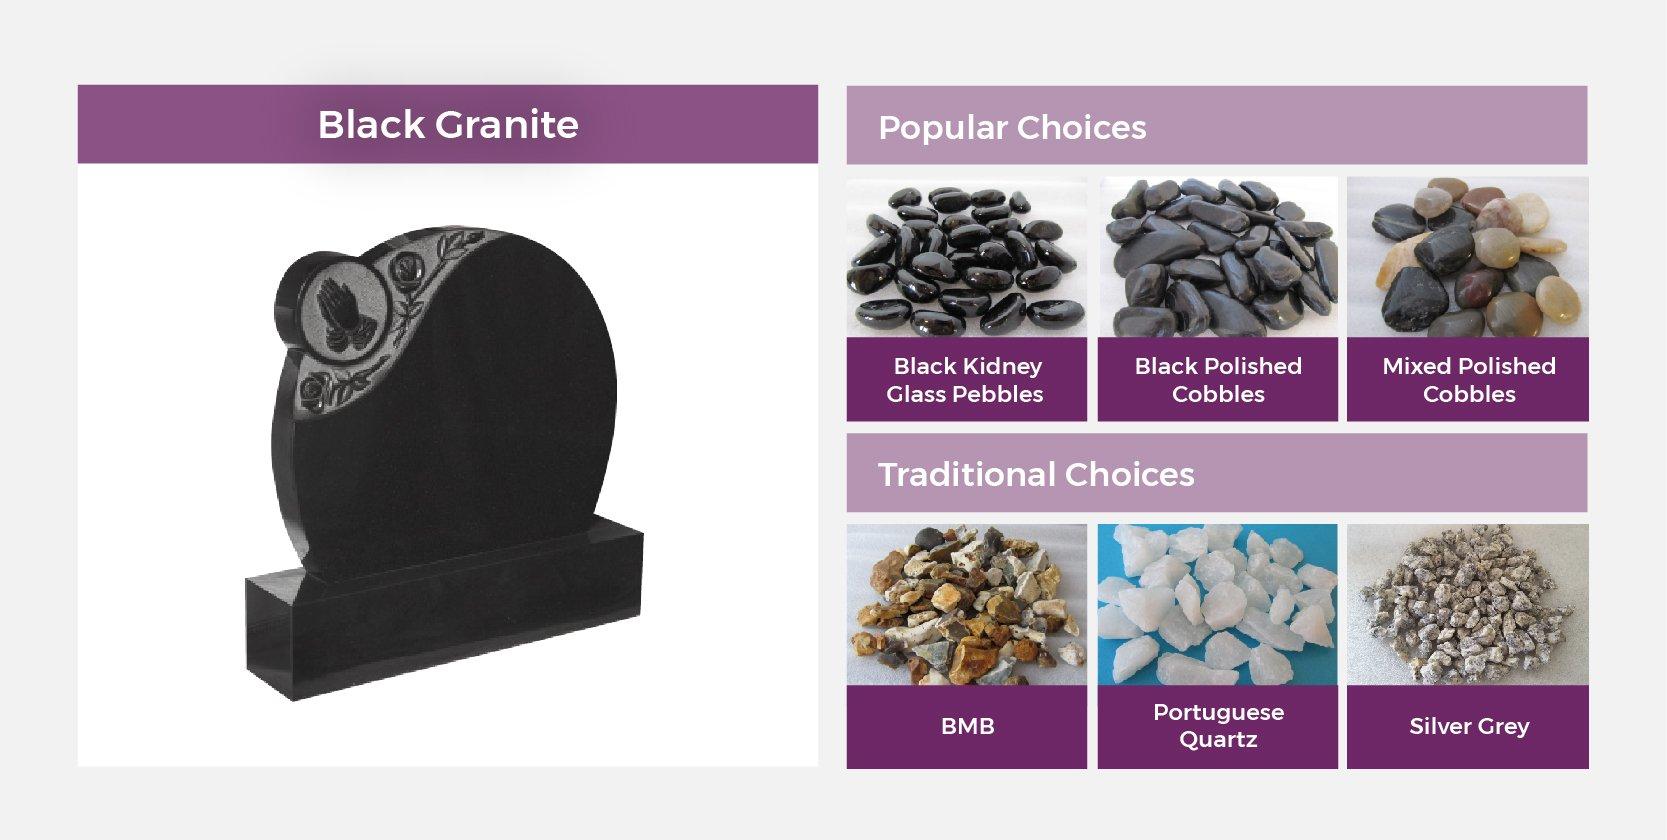 Black Granite Matching Stones